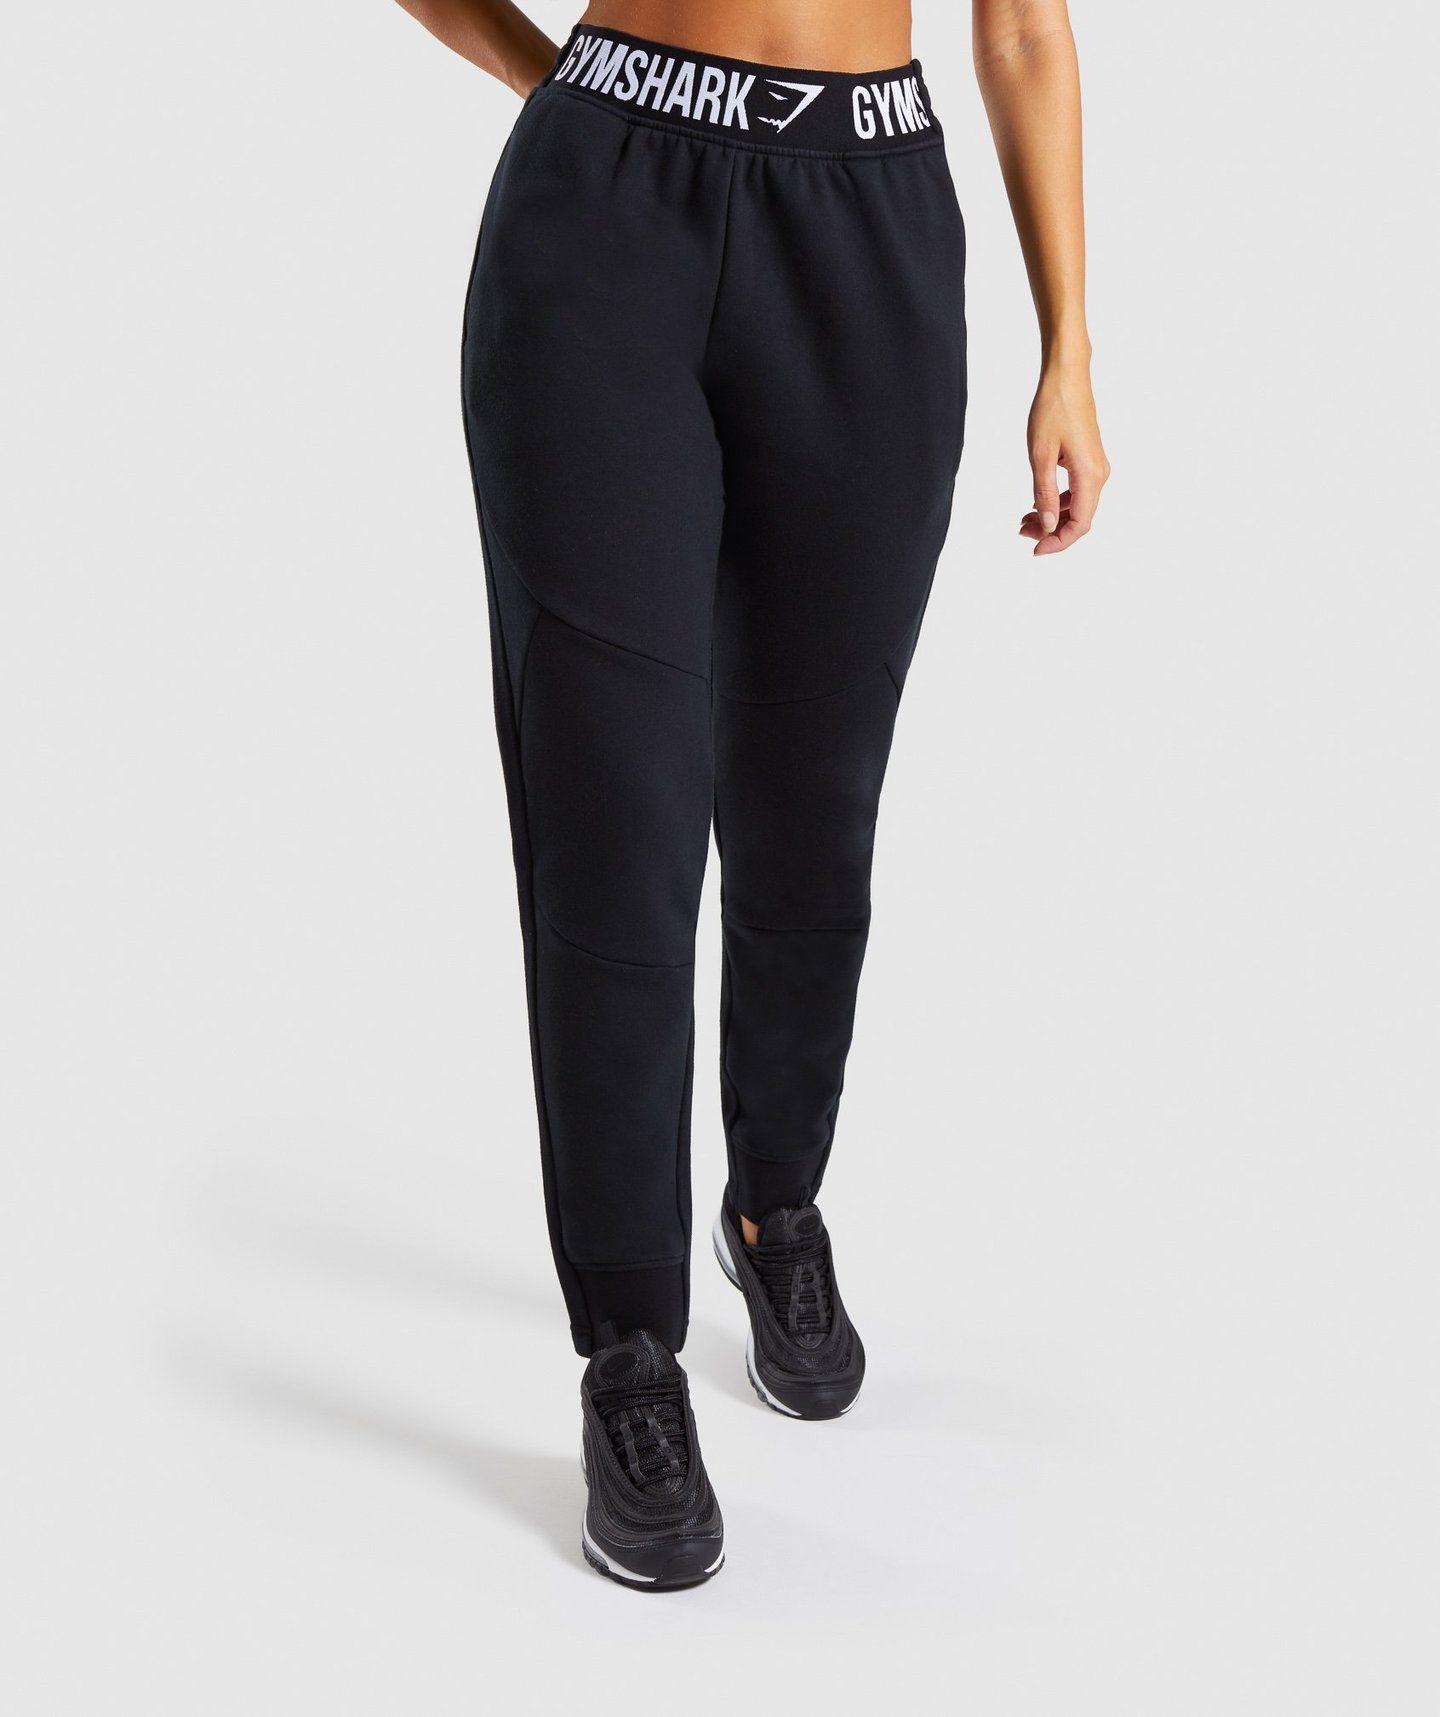 9cbeb45280 Gymshark Comfy Tracksuit Bottoms - Black in 2019 | active wear ...